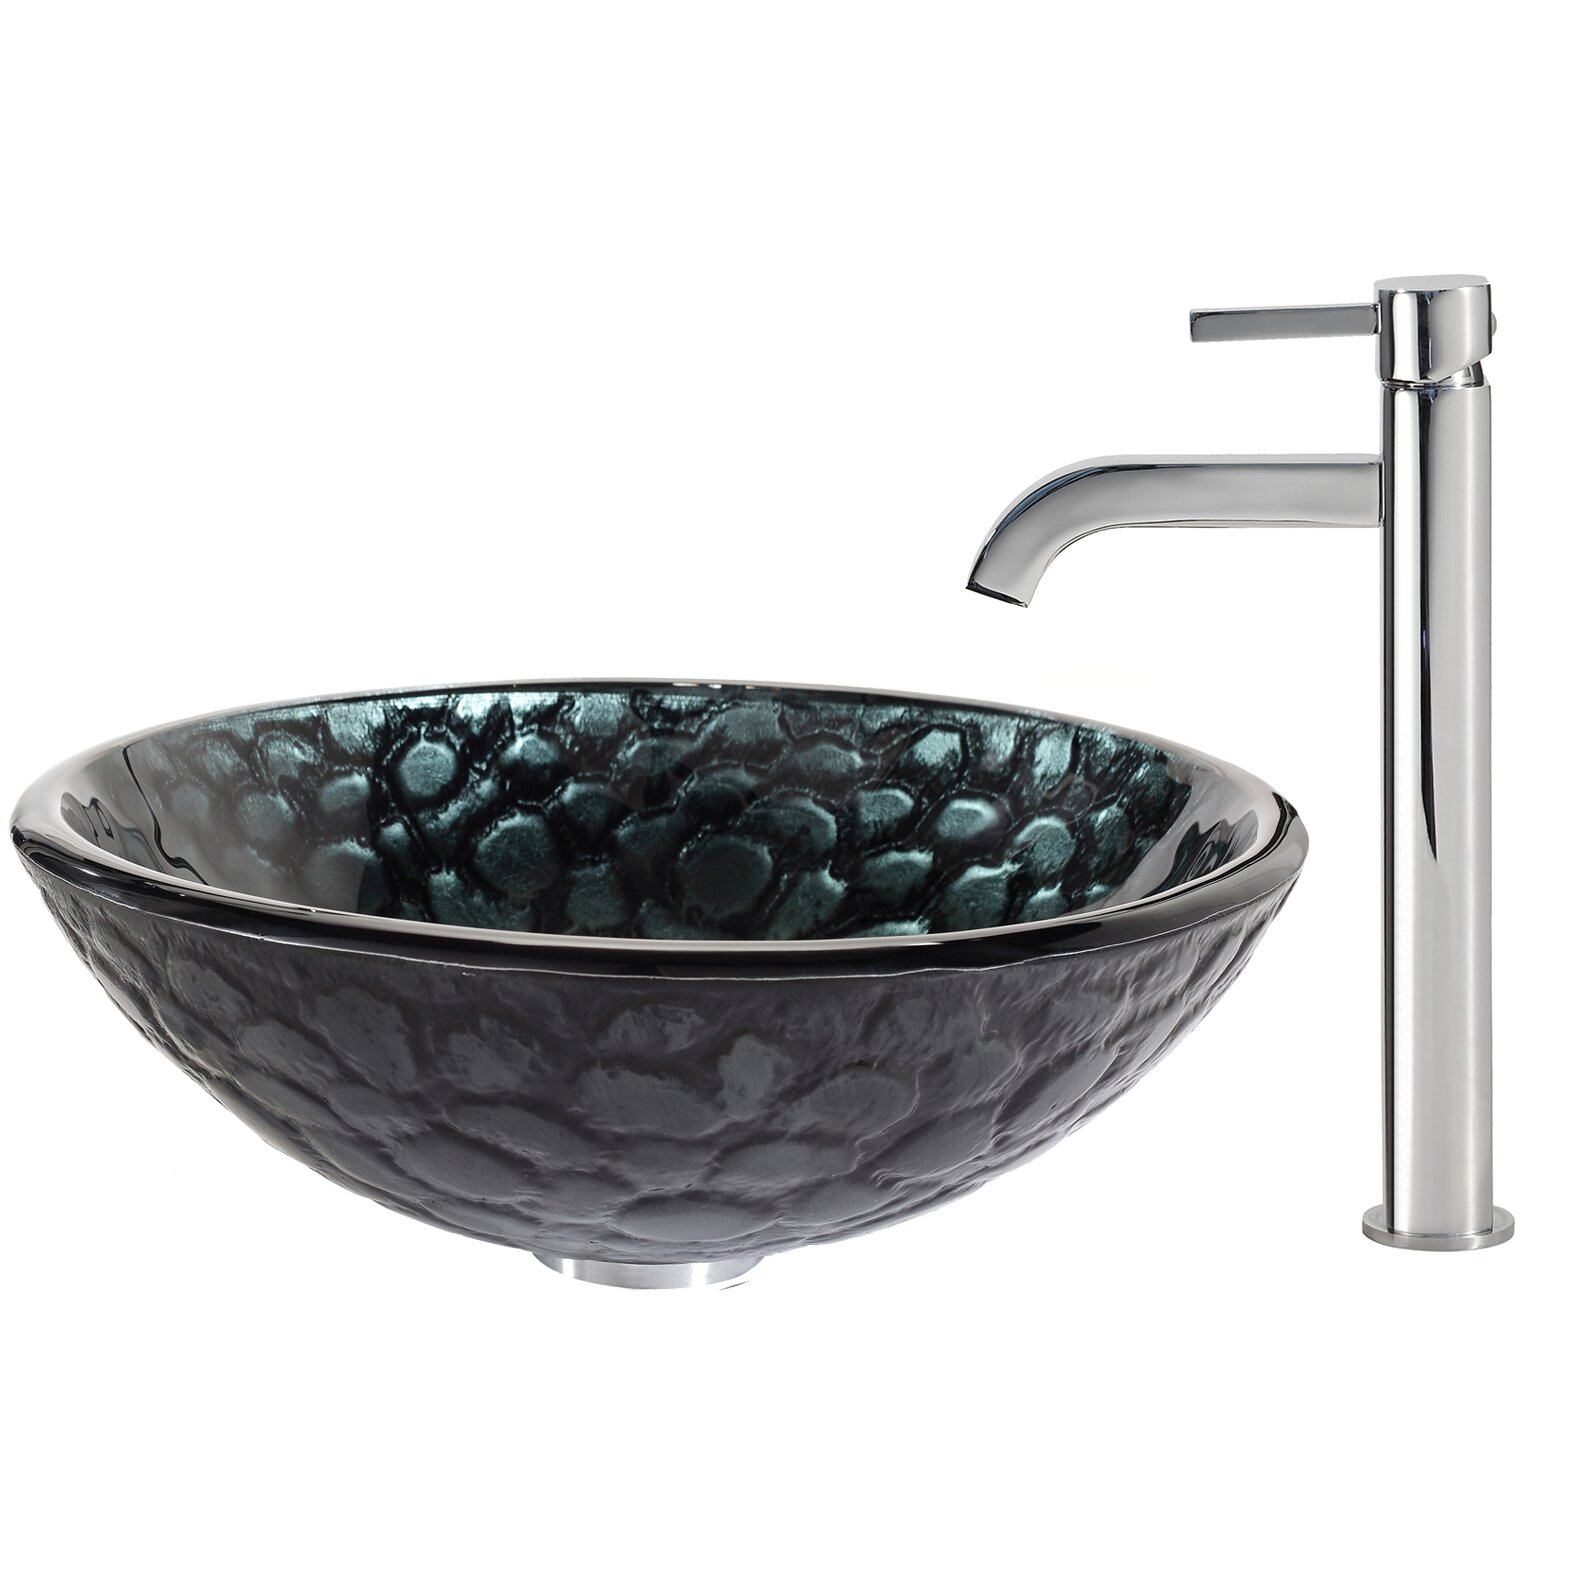 Kraus Kratos Glass Vessel Sink with Ramus Faucet Wayfair